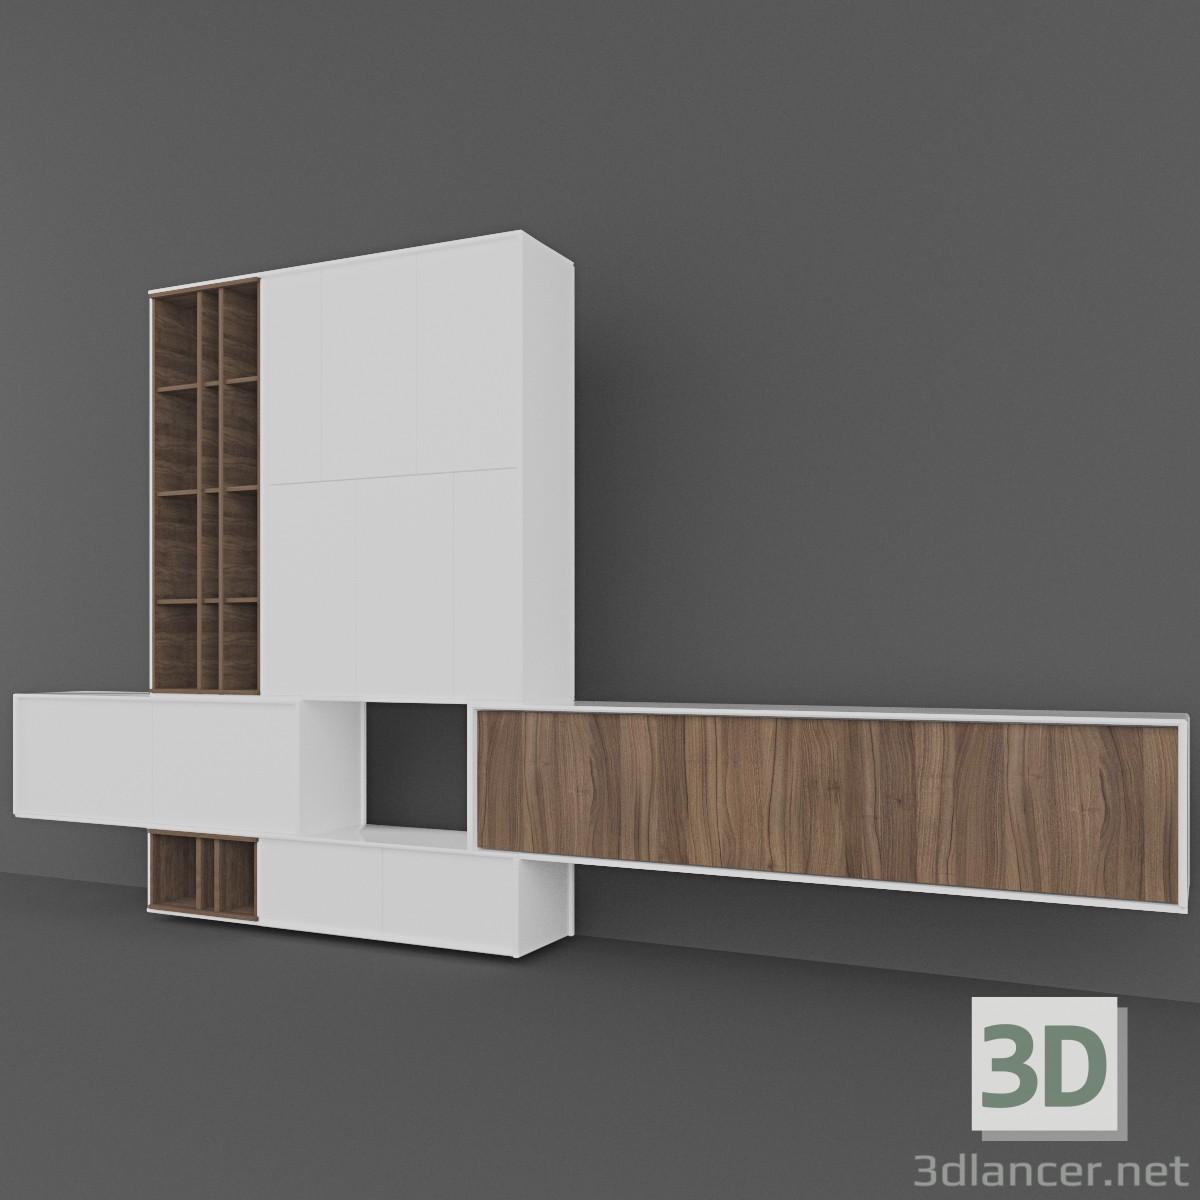 3d Hulsta living room cabinets model buy - render